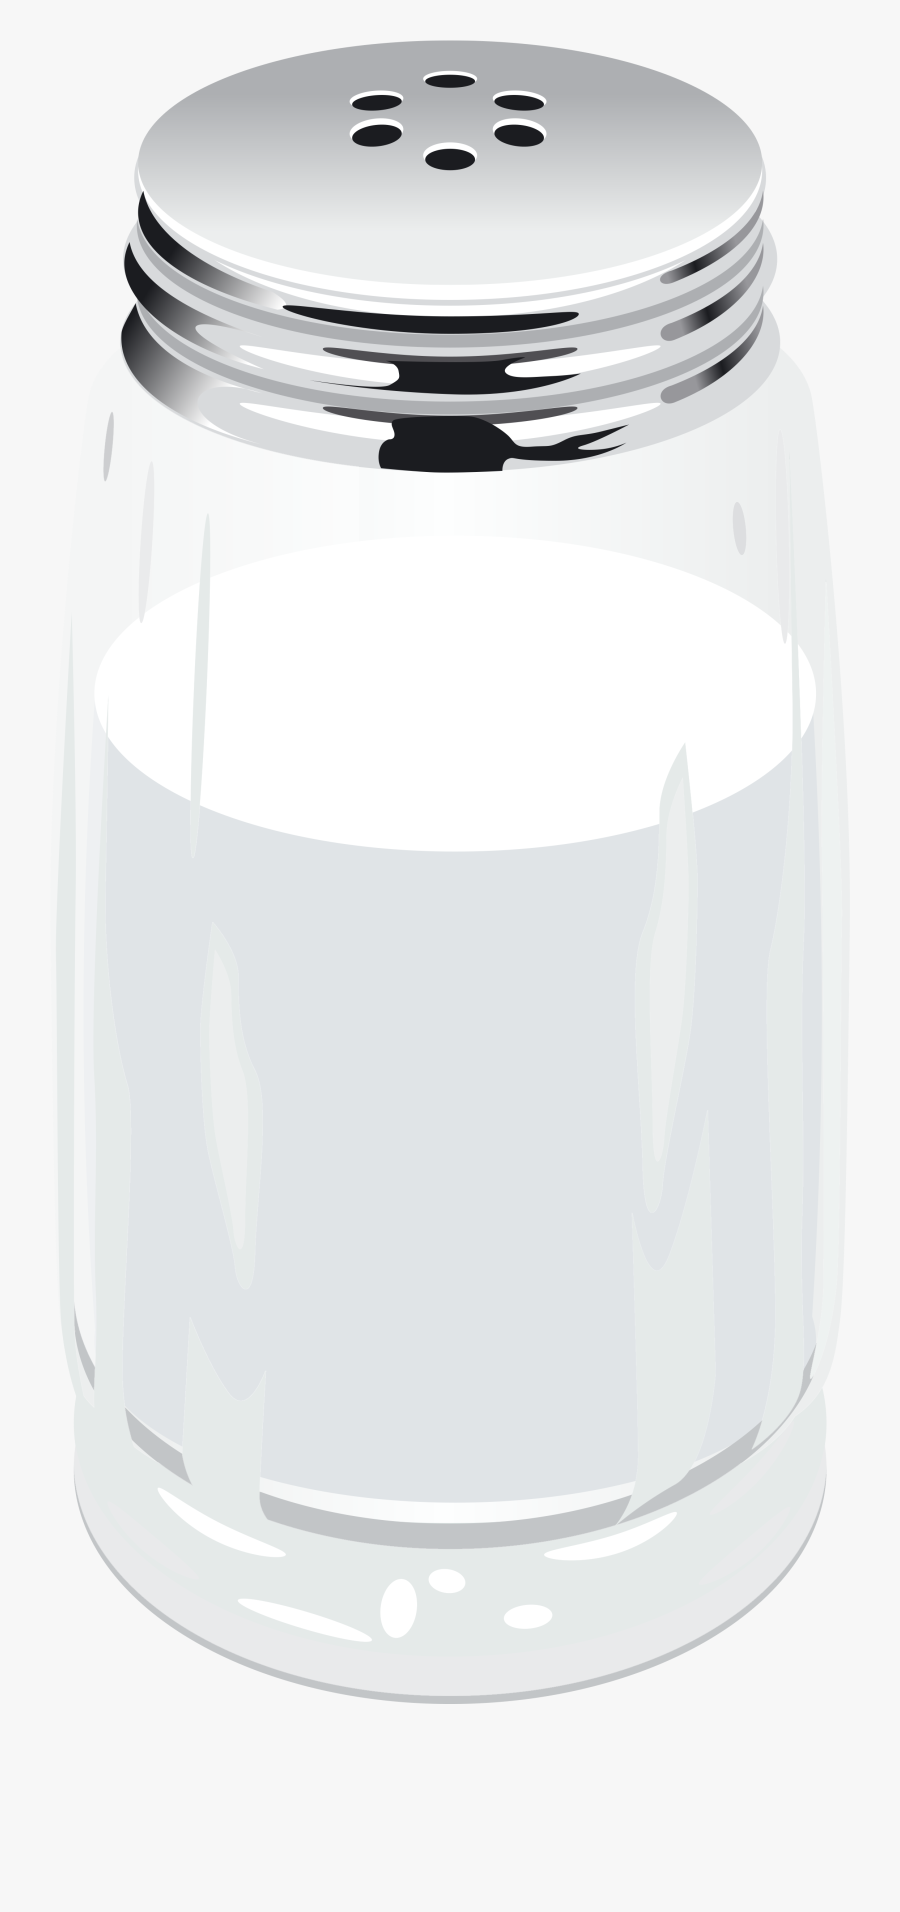 Salt Shaker Png Clipart.